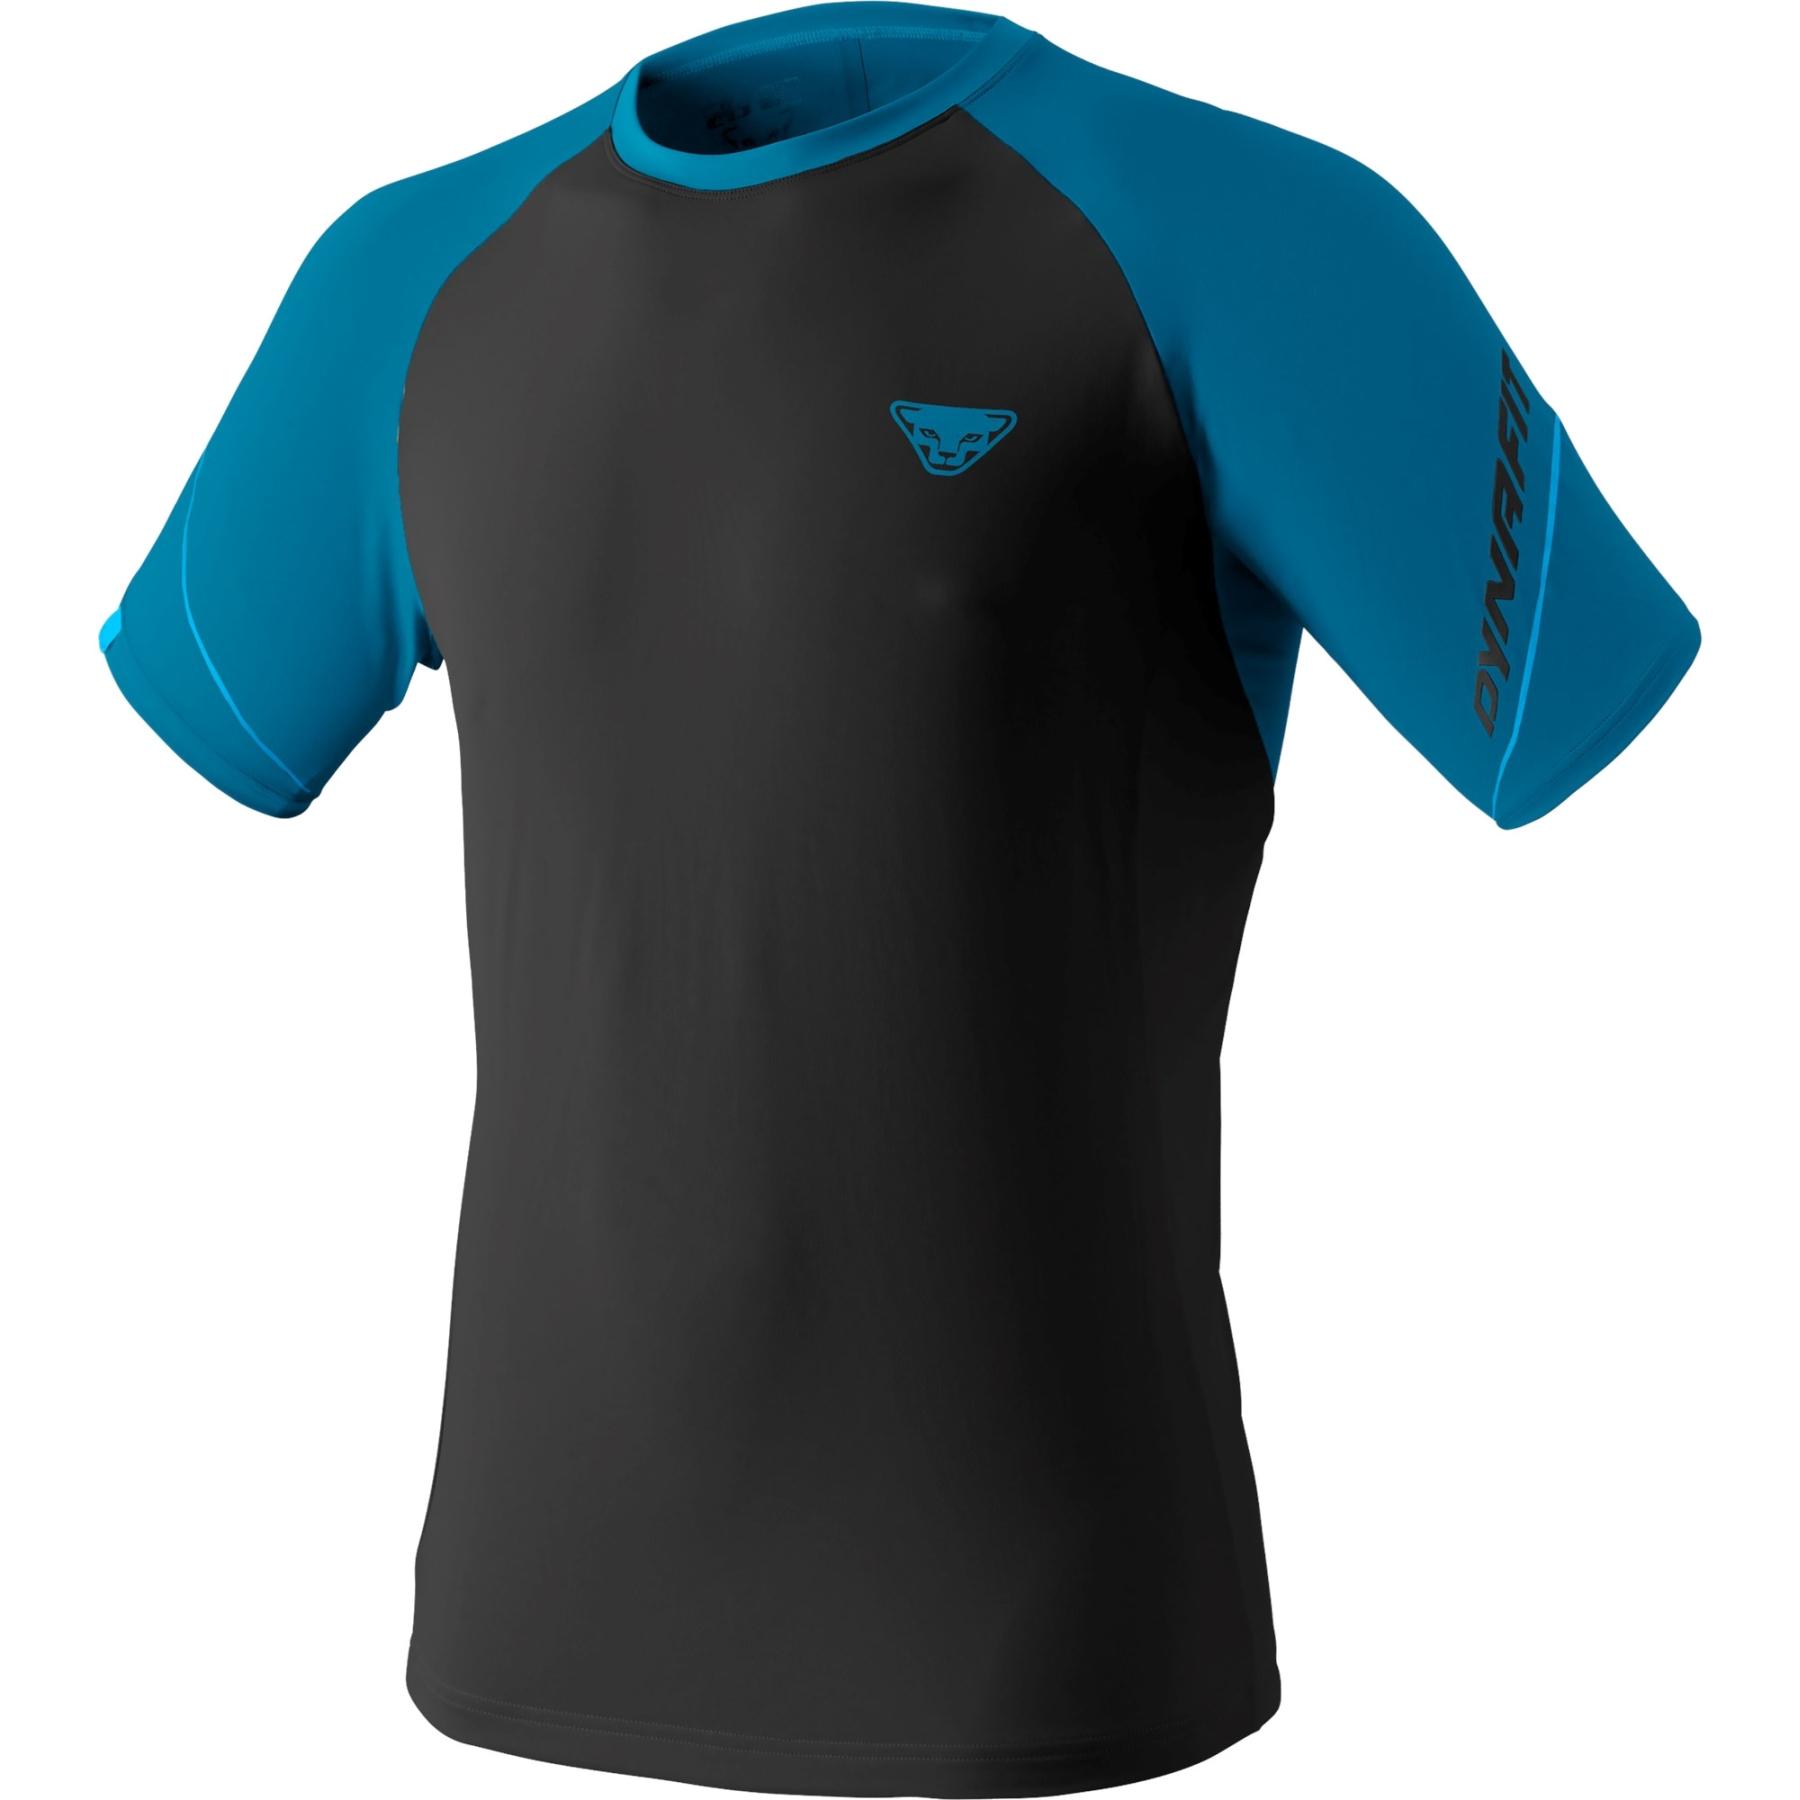 Dynafit Alpine Pro T-Shirt Men - Reef